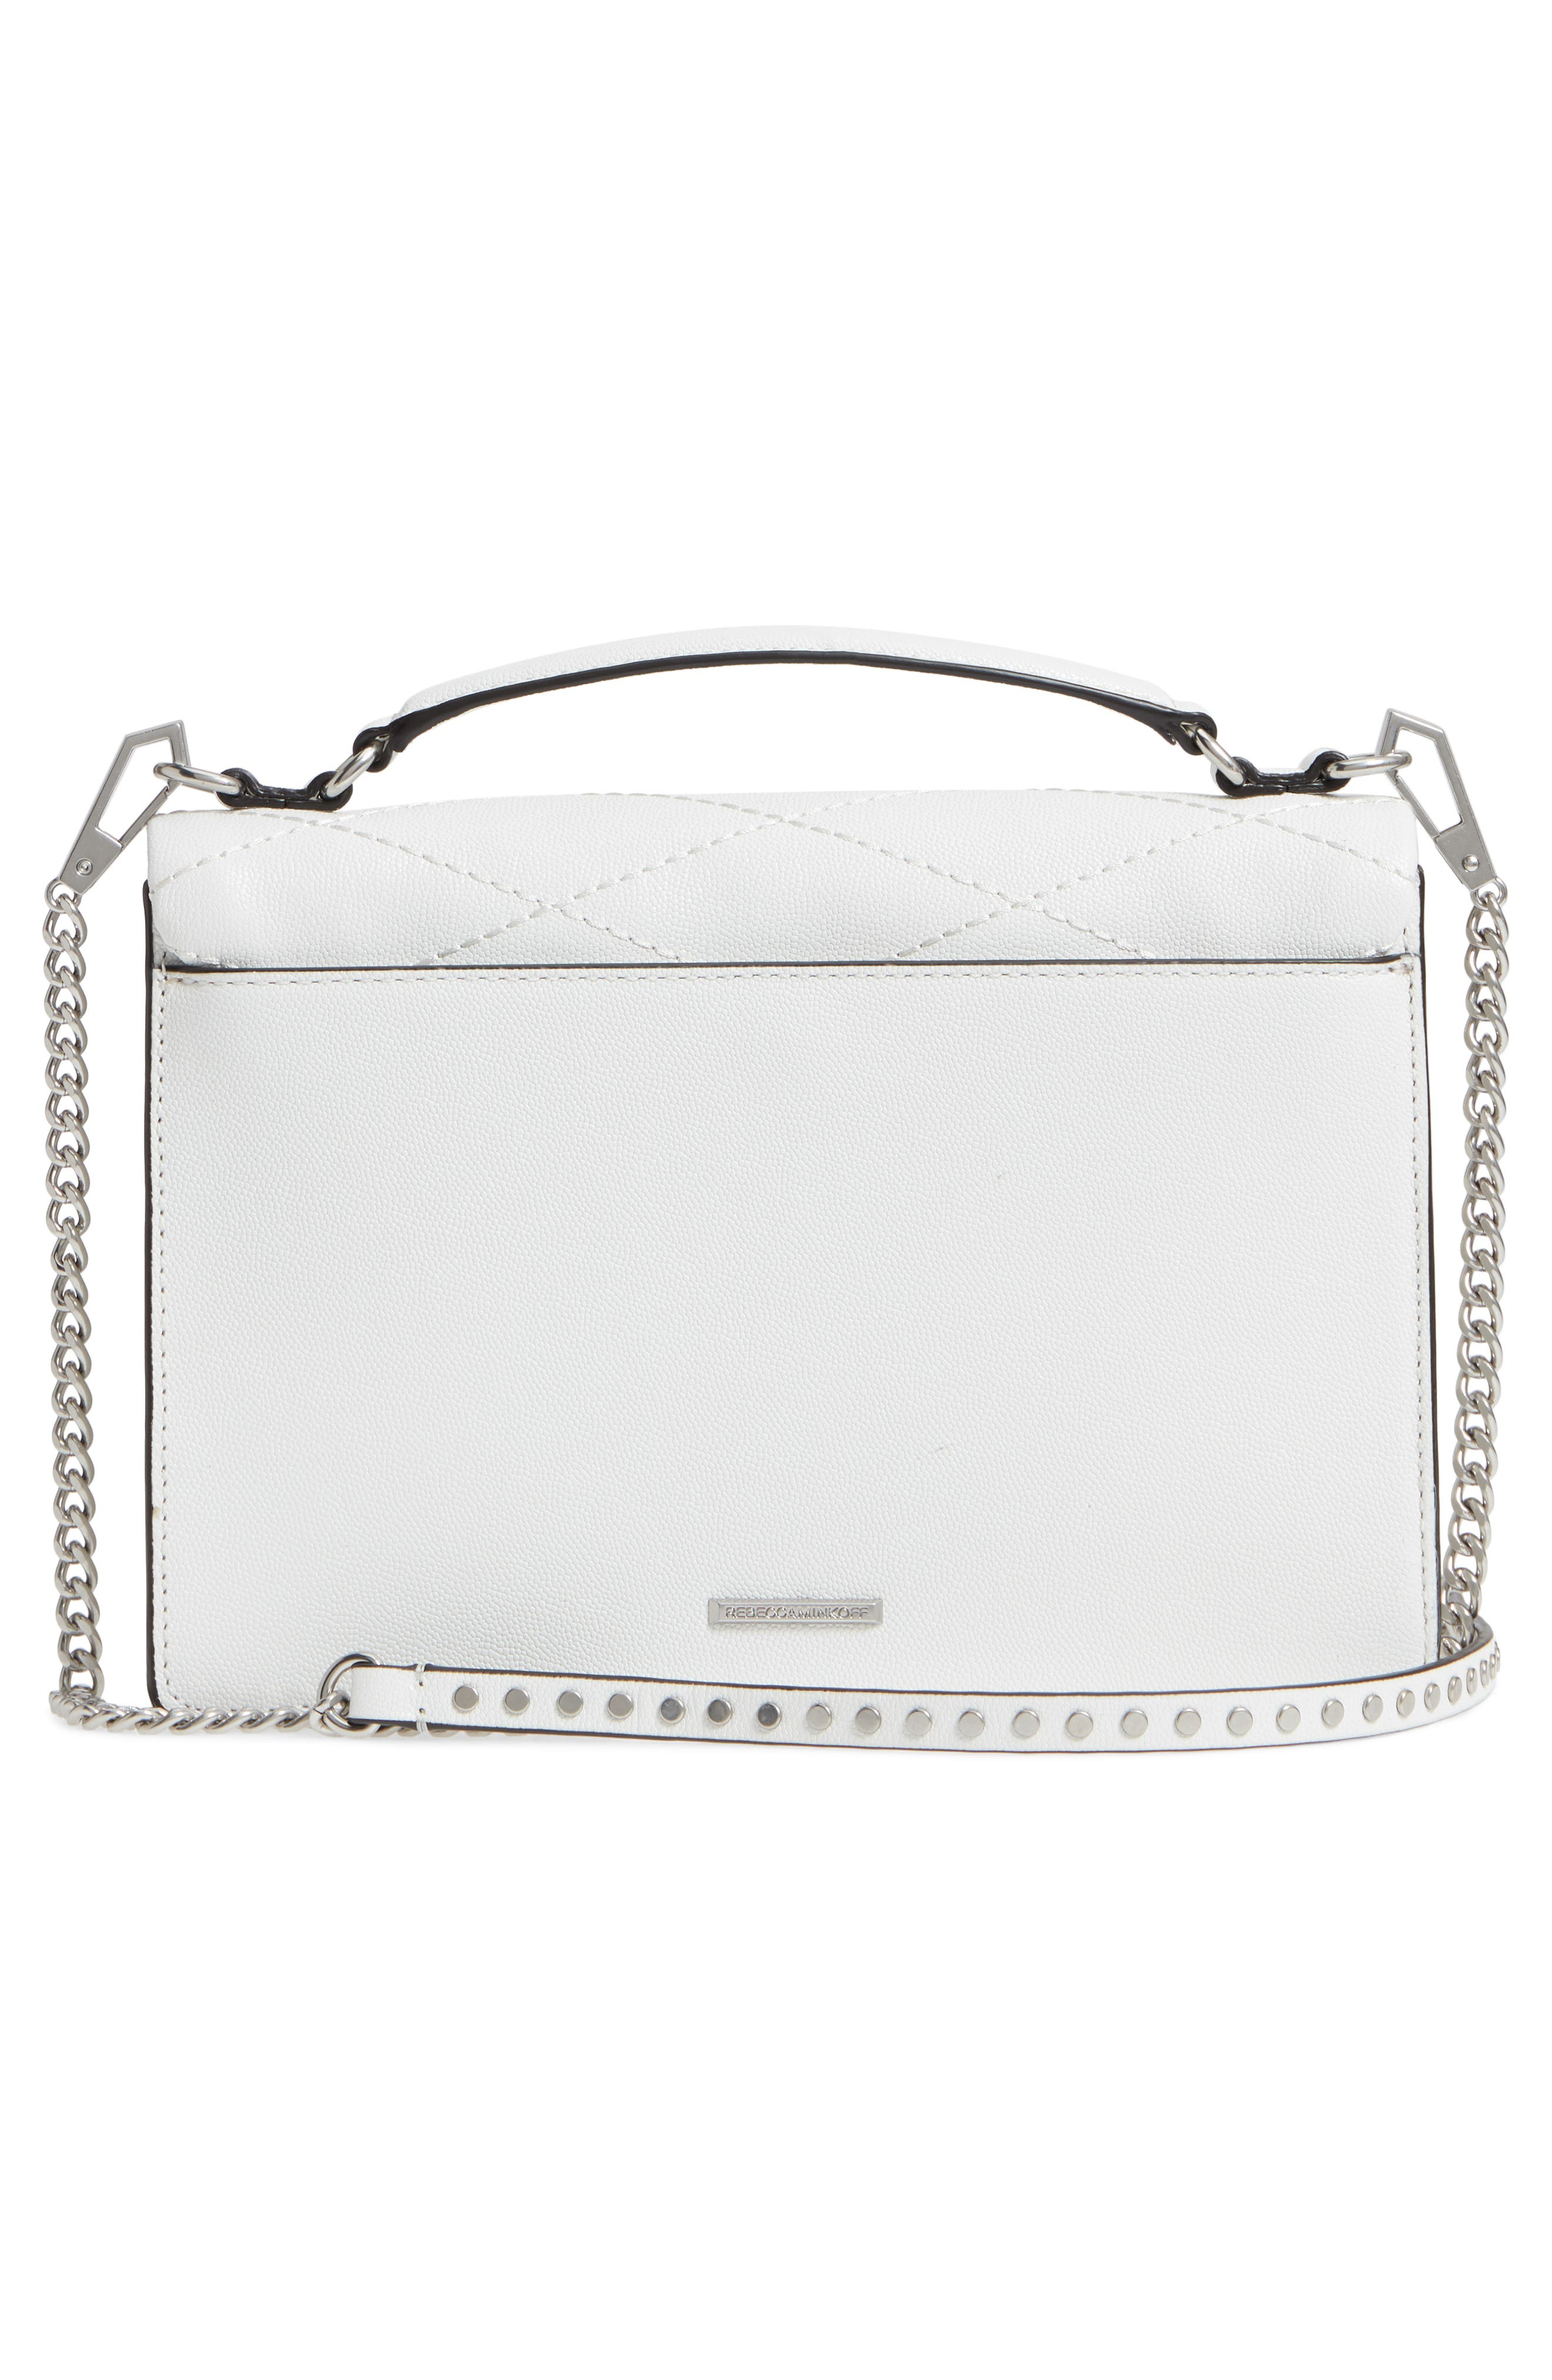 Medium Je T'aime Convertible Leather Crossbody Bag,                             Alternate thumbnail 23, color,